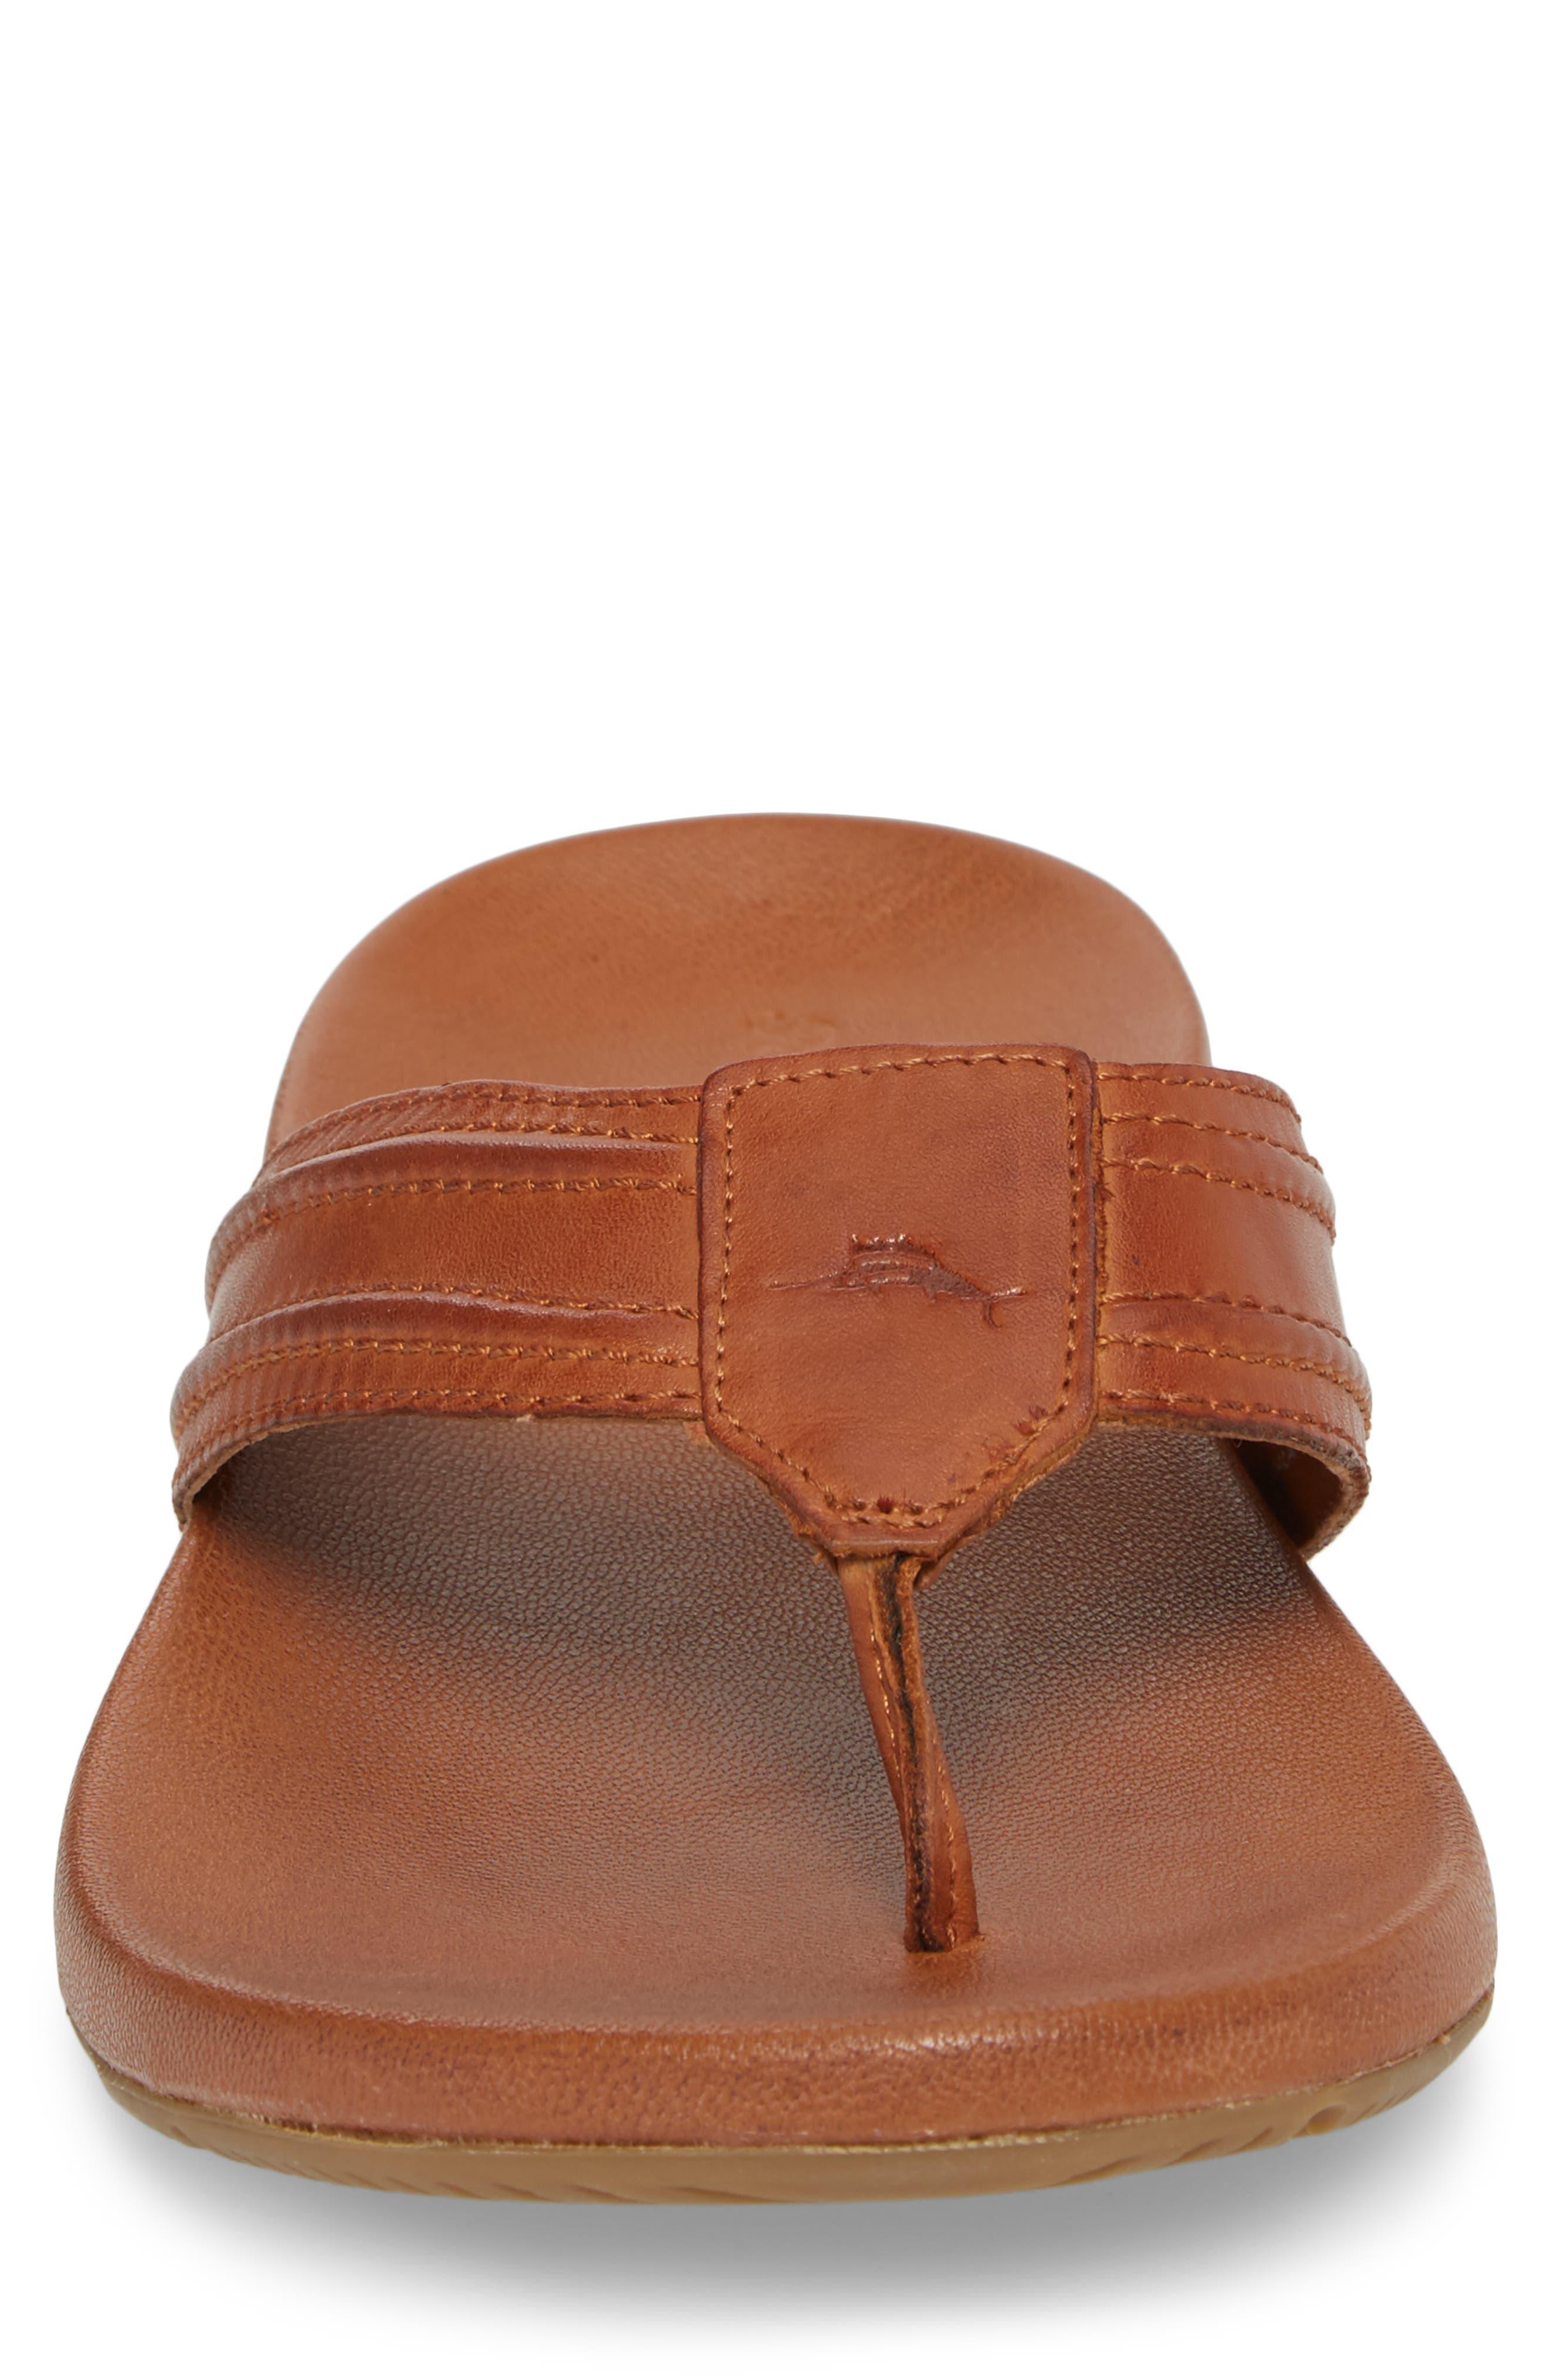 Mayaguana Flip Flop,                             Alternate thumbnail 4, color,                             Tan Leather